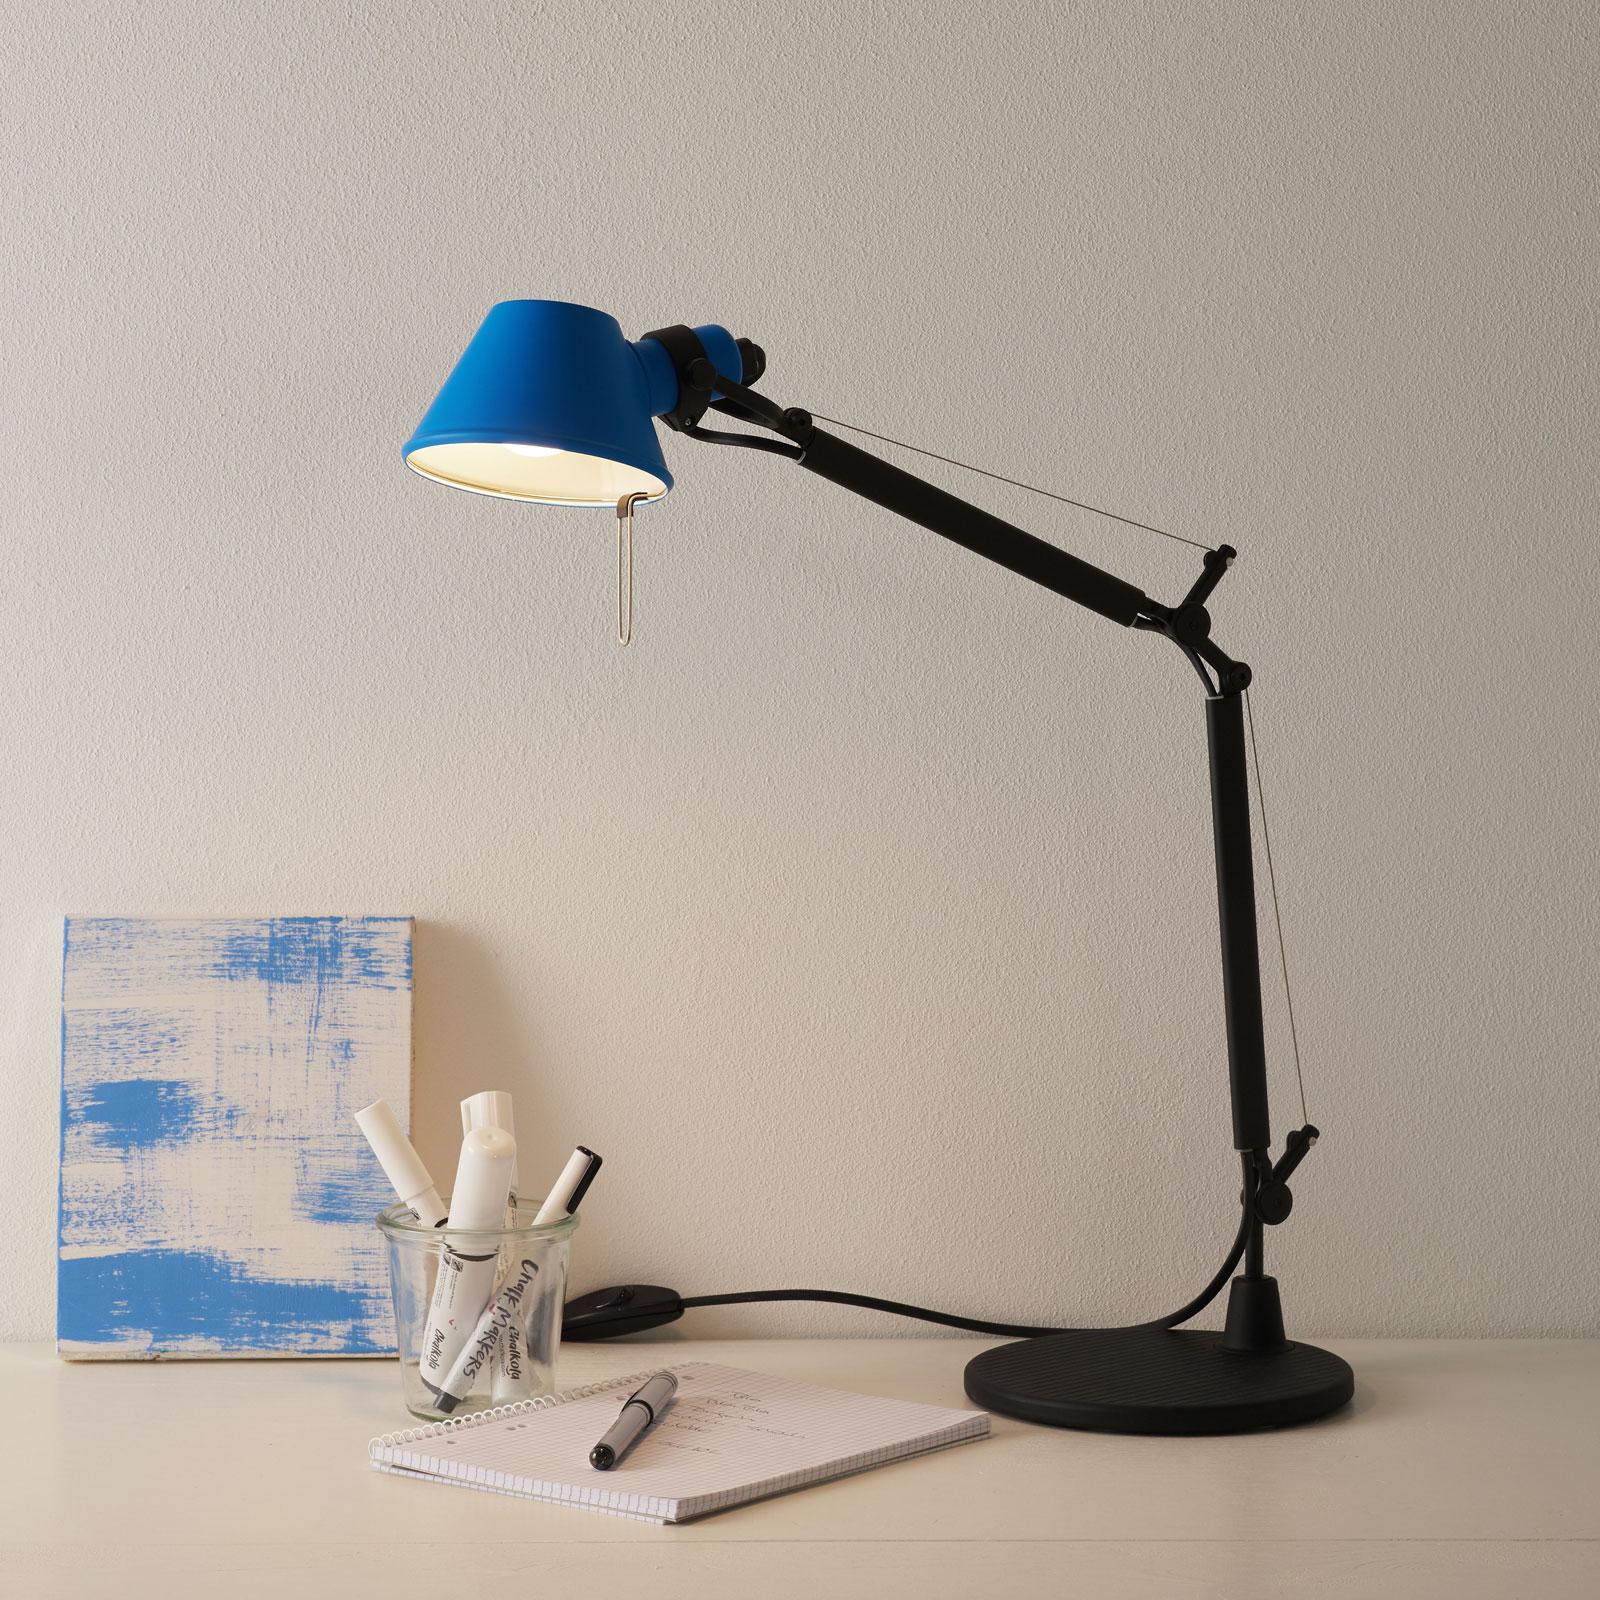 Artemide Tolomeo Micro Bicolor bord svart/blå